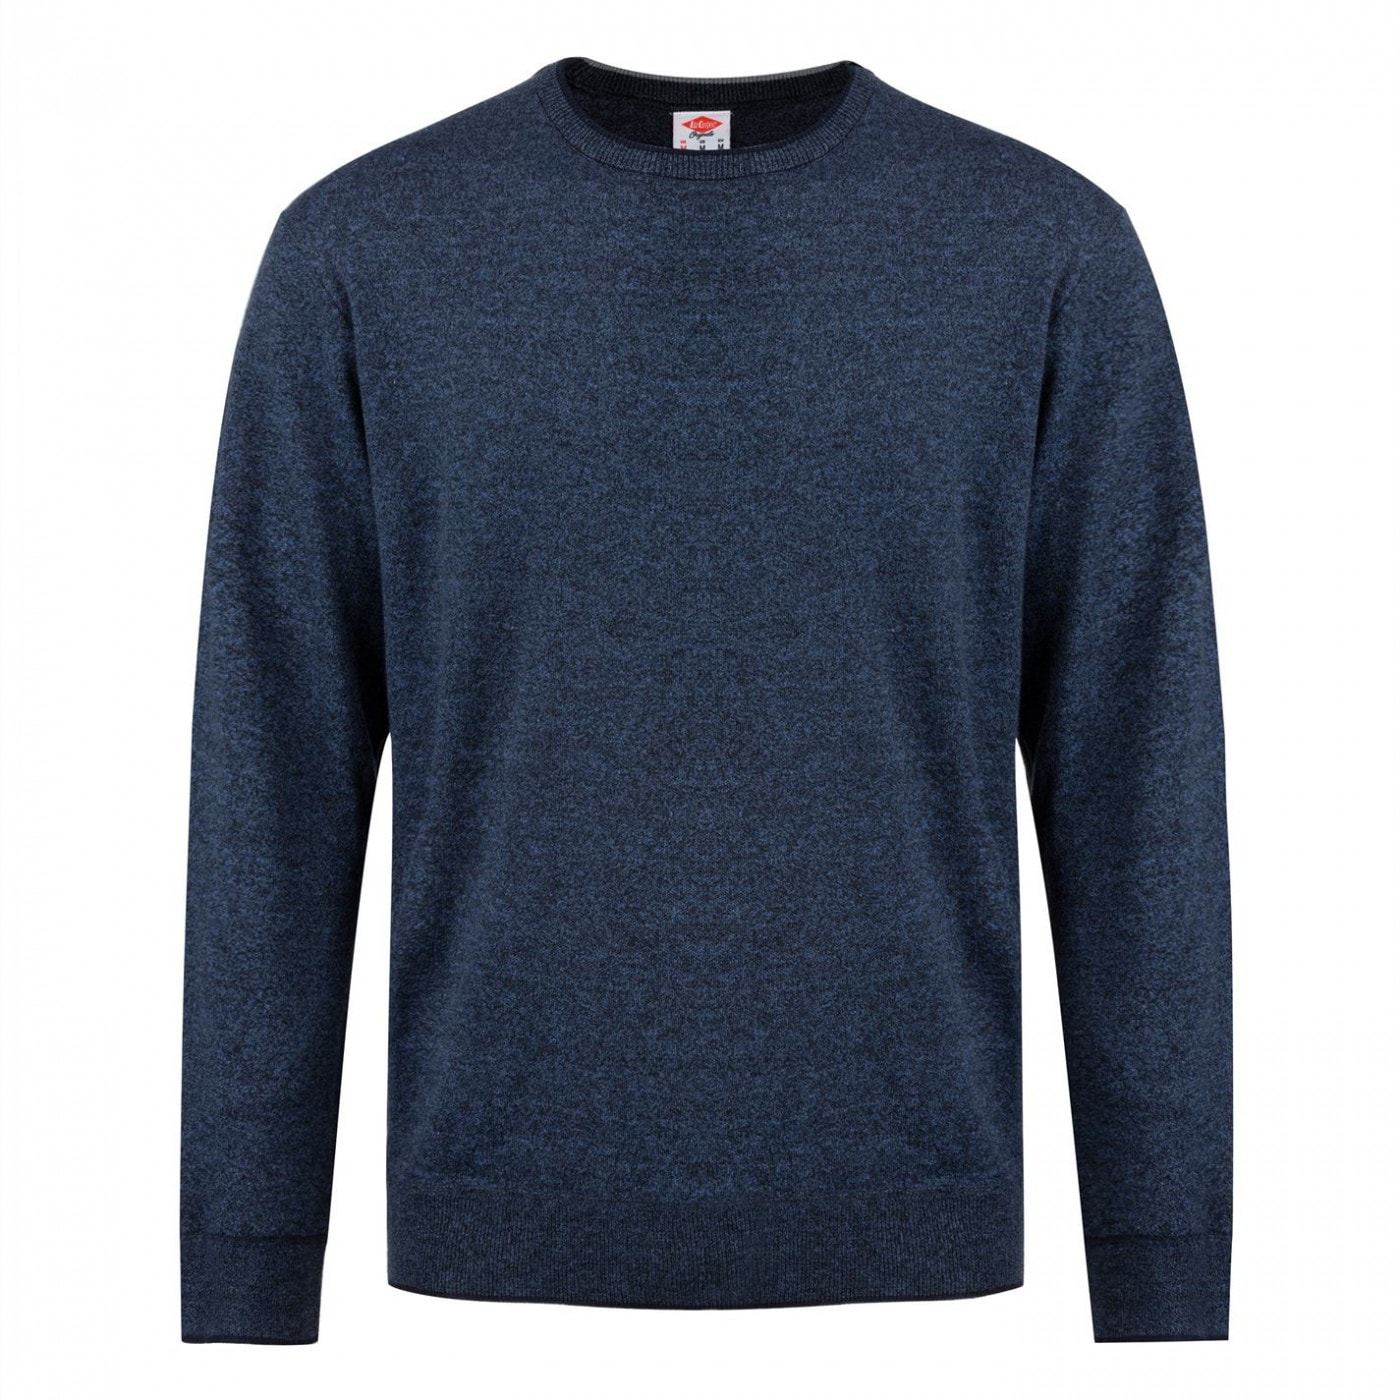 Men's sweater Lee Cooper Seal Knit